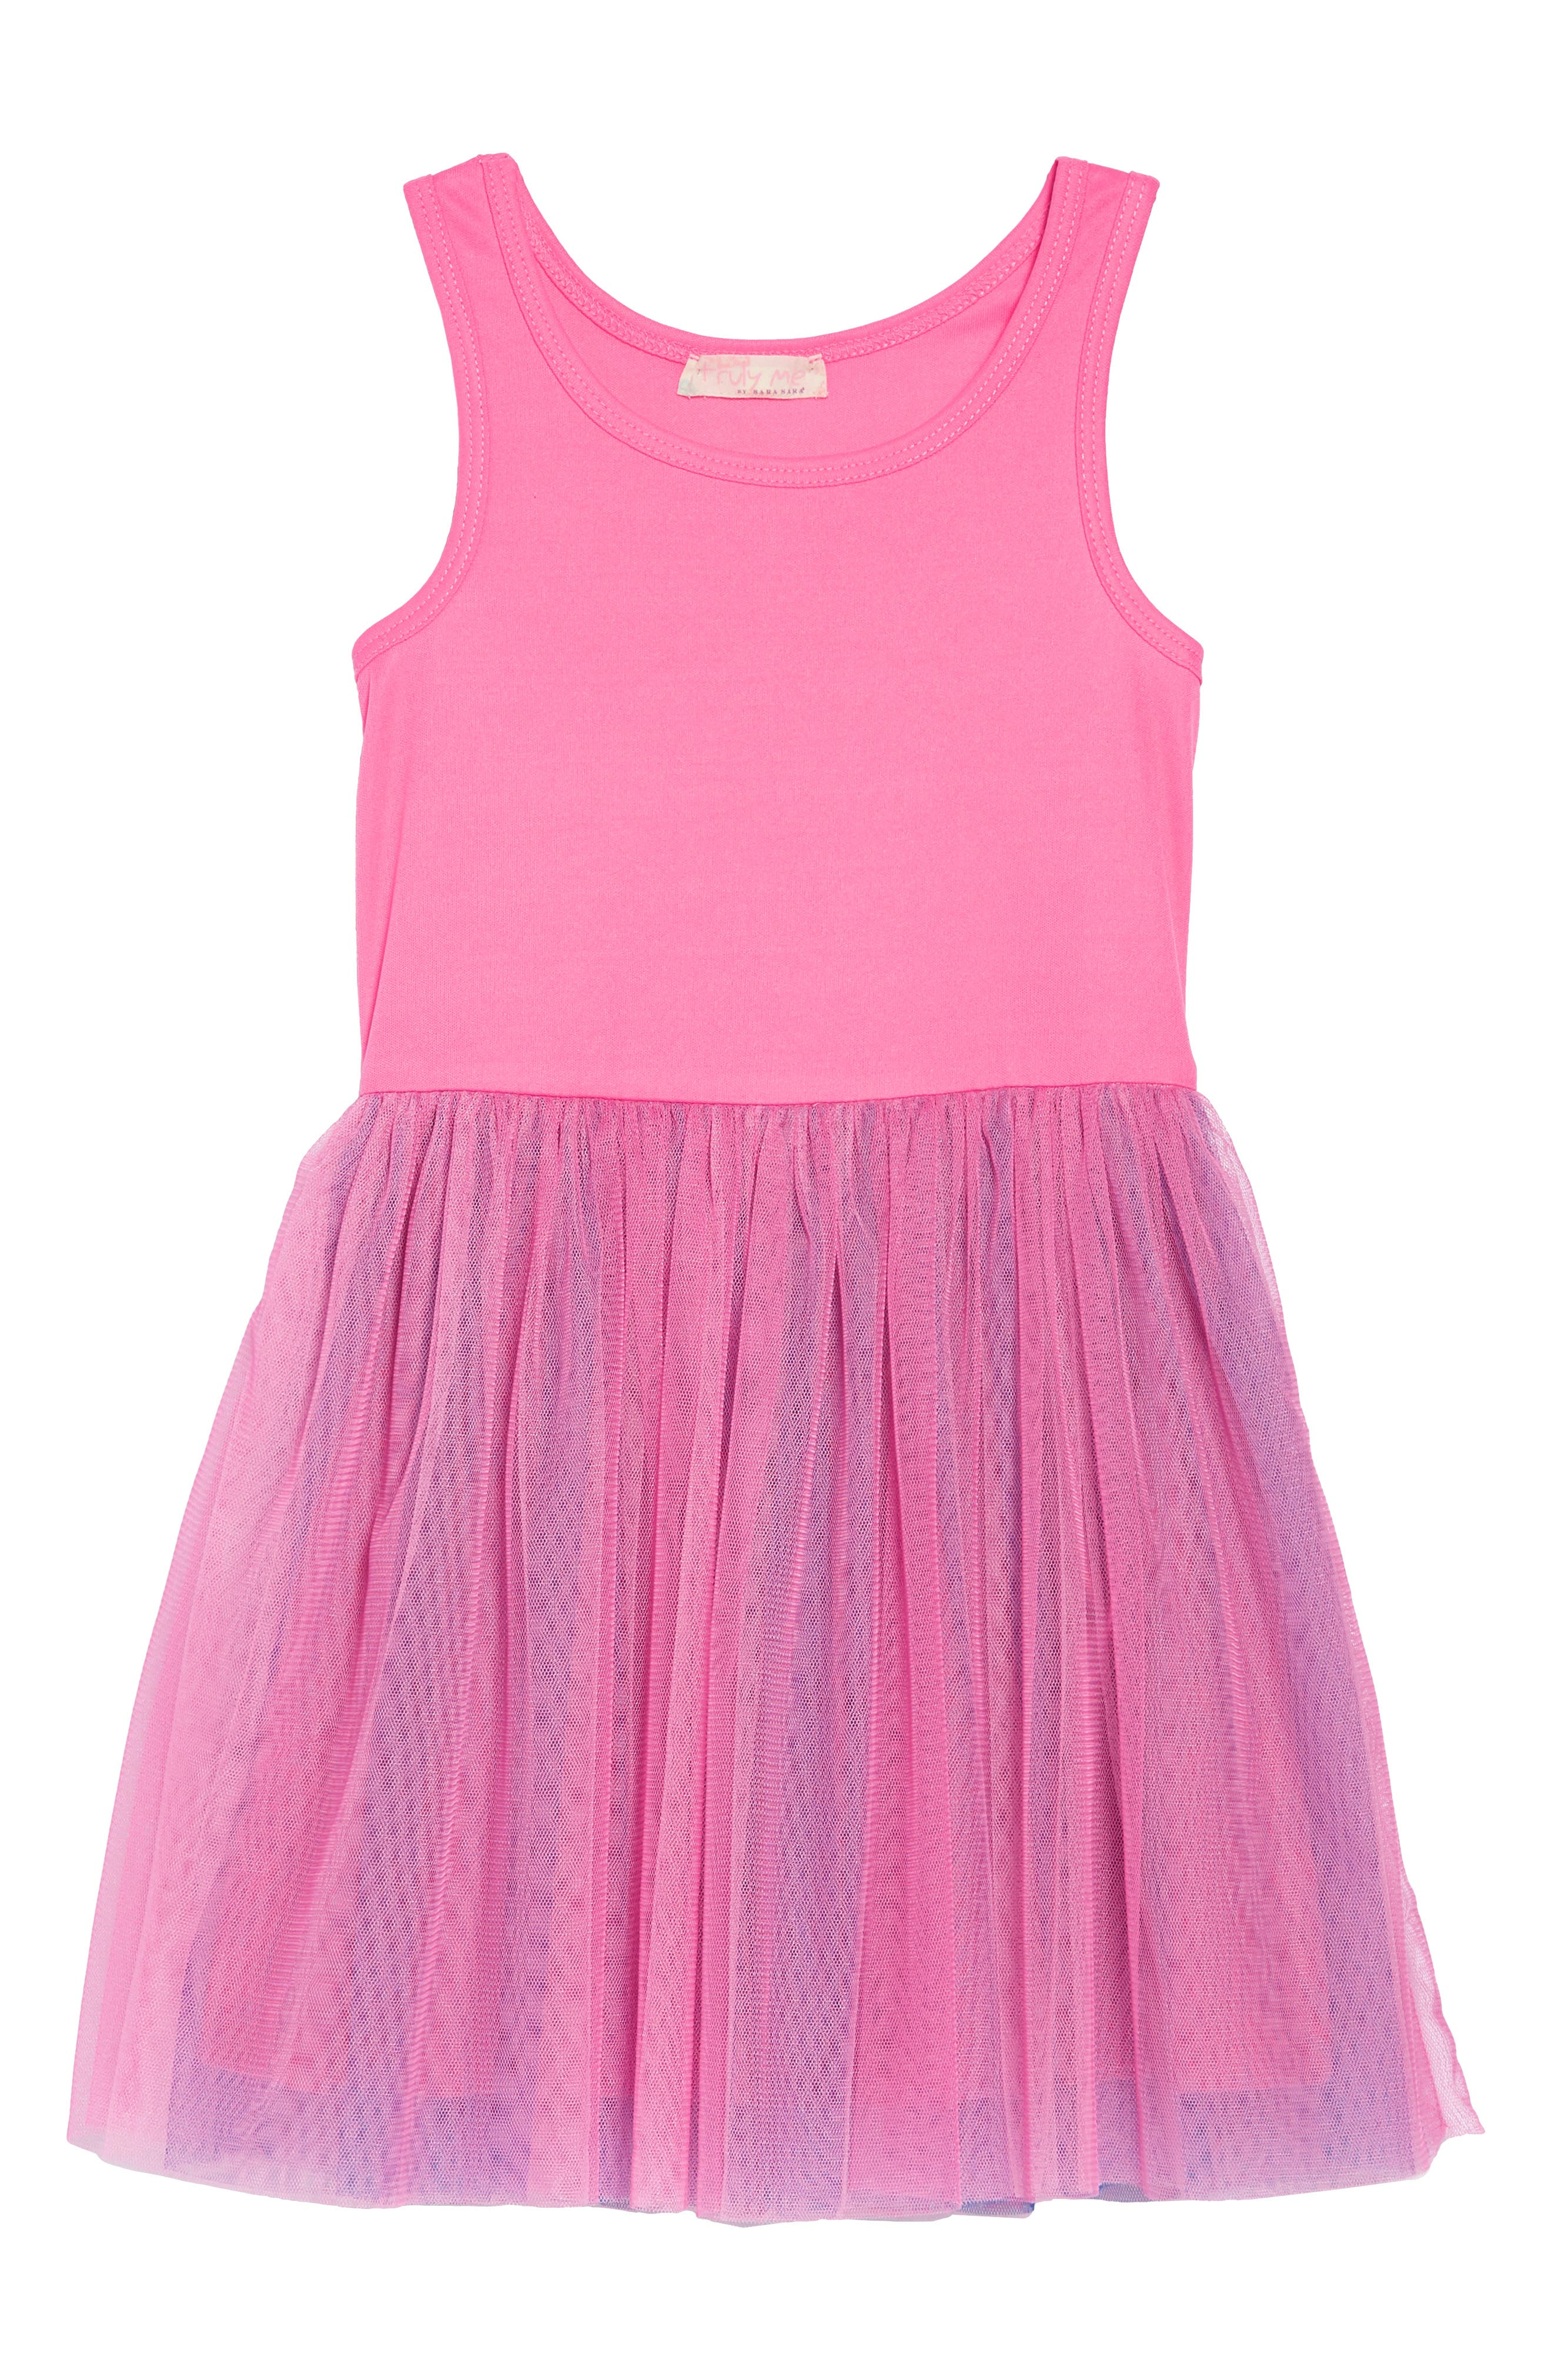 Appliqué Top & Tutu Dress Set,                             Alternate thumbnail 4, color,                             NAVY-PINK